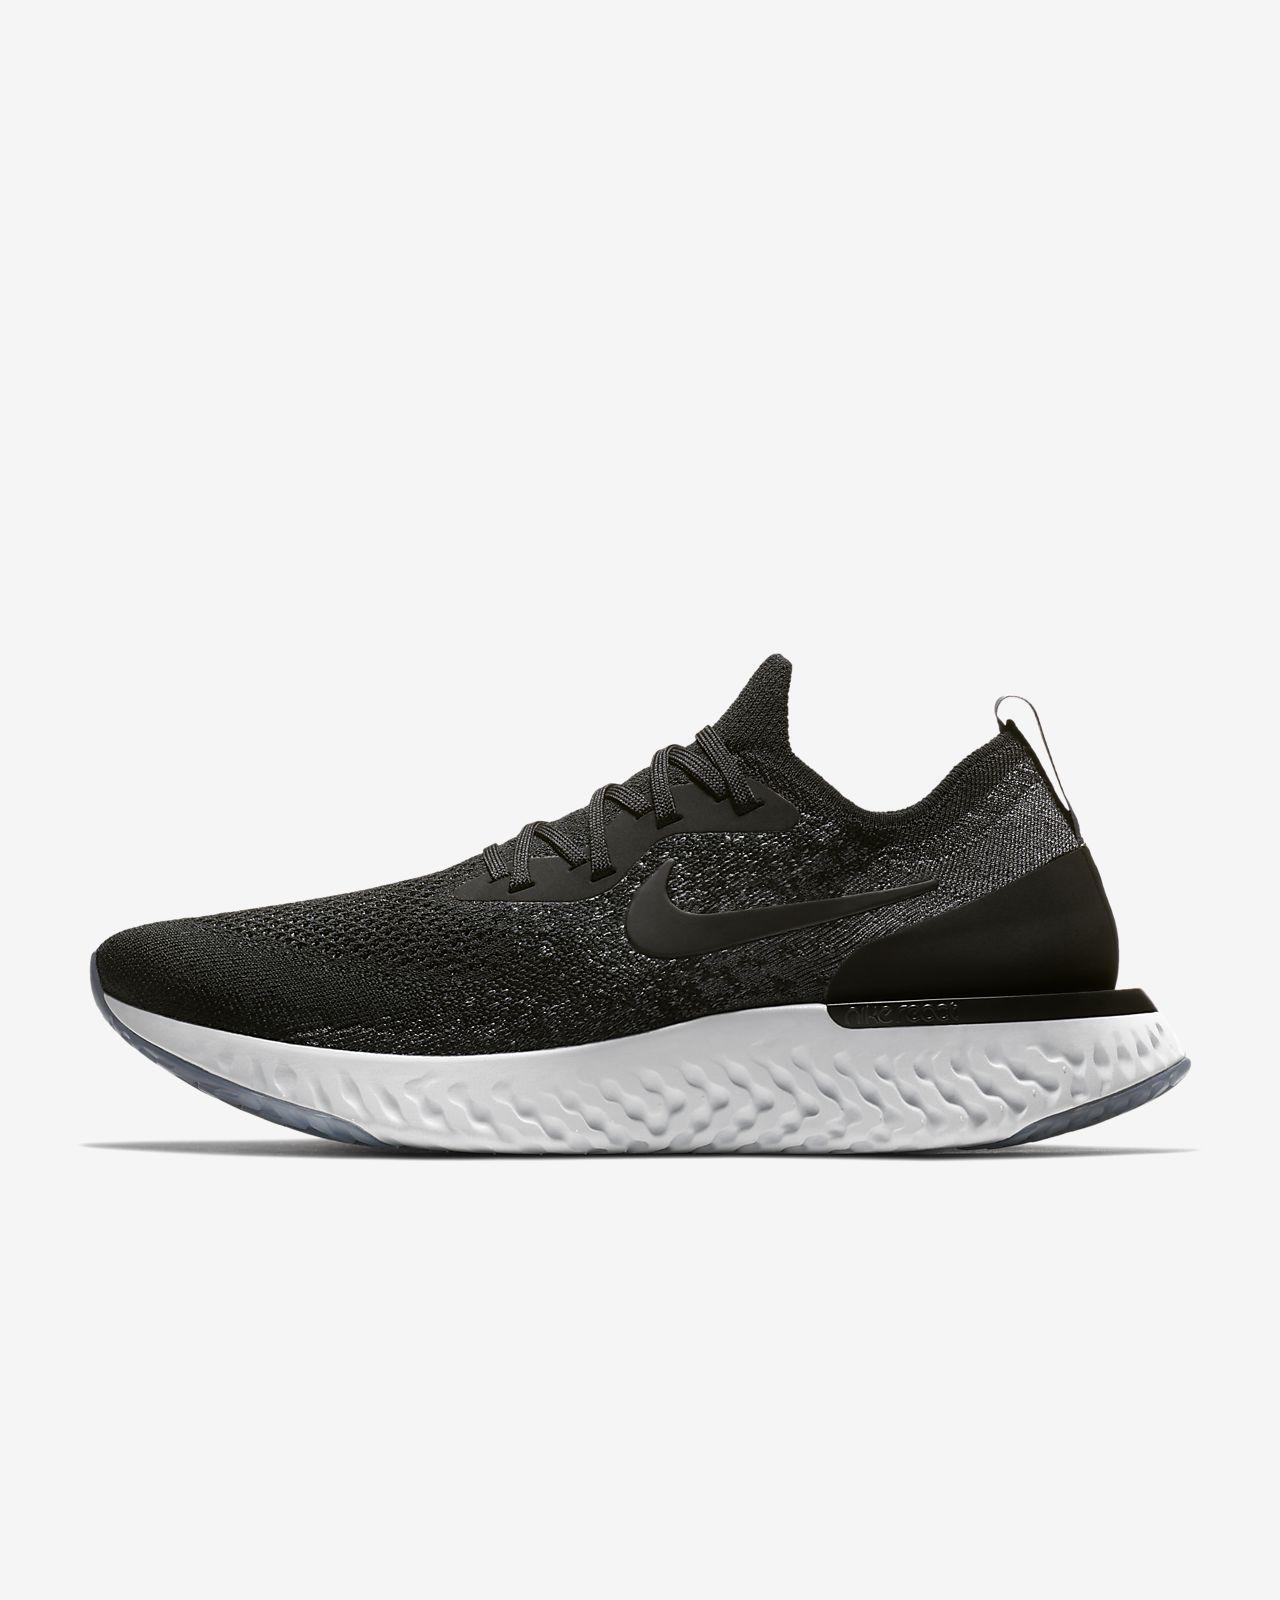 nike epic react flyknit men's running shoe$150